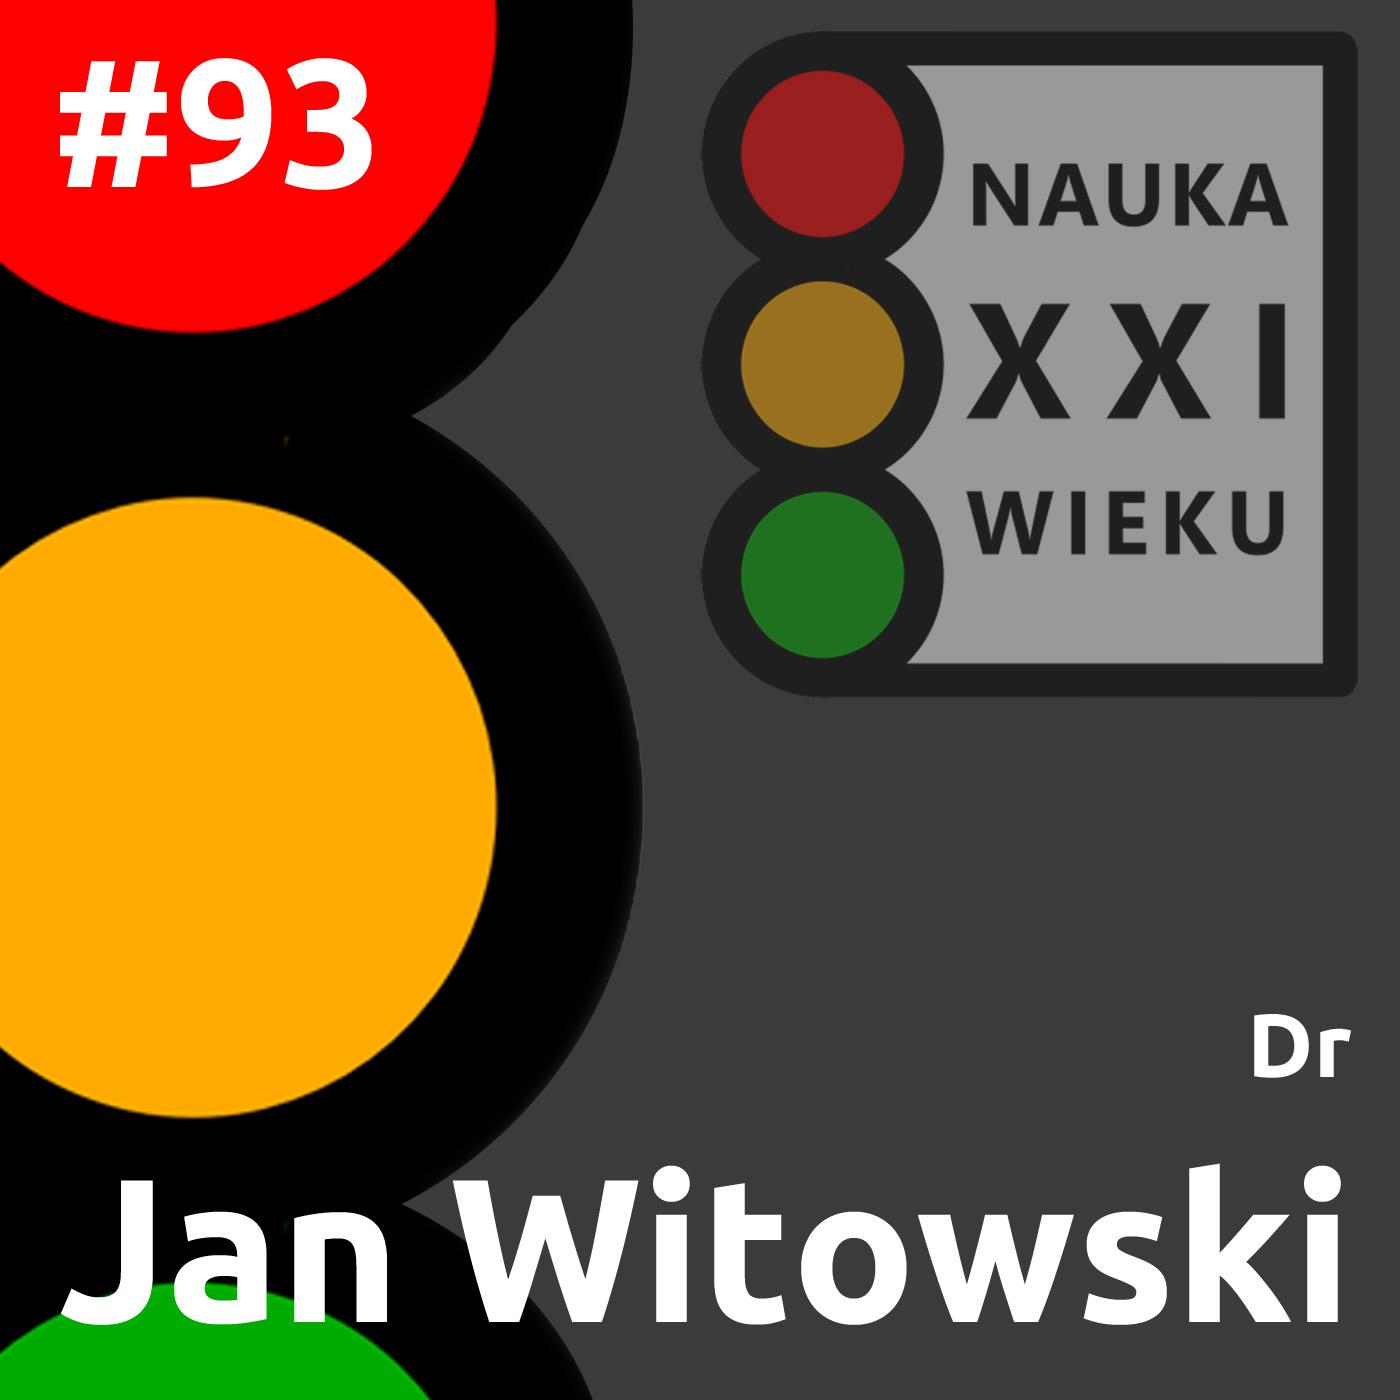 #93 - Jan Witowski